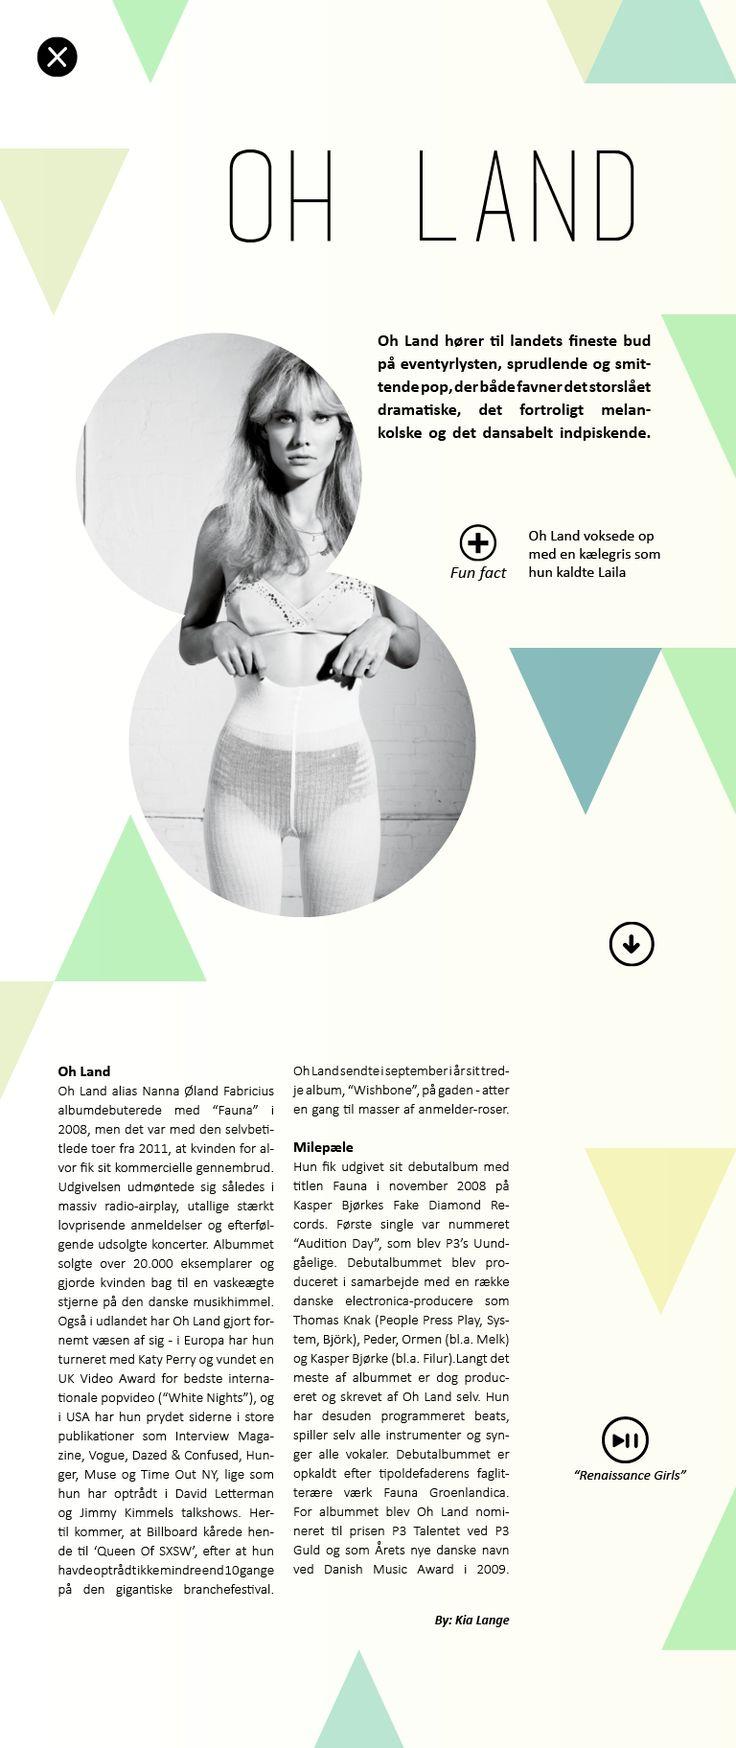 Oh Land artikel, interaktivt ipad magasin. By Kia Lange